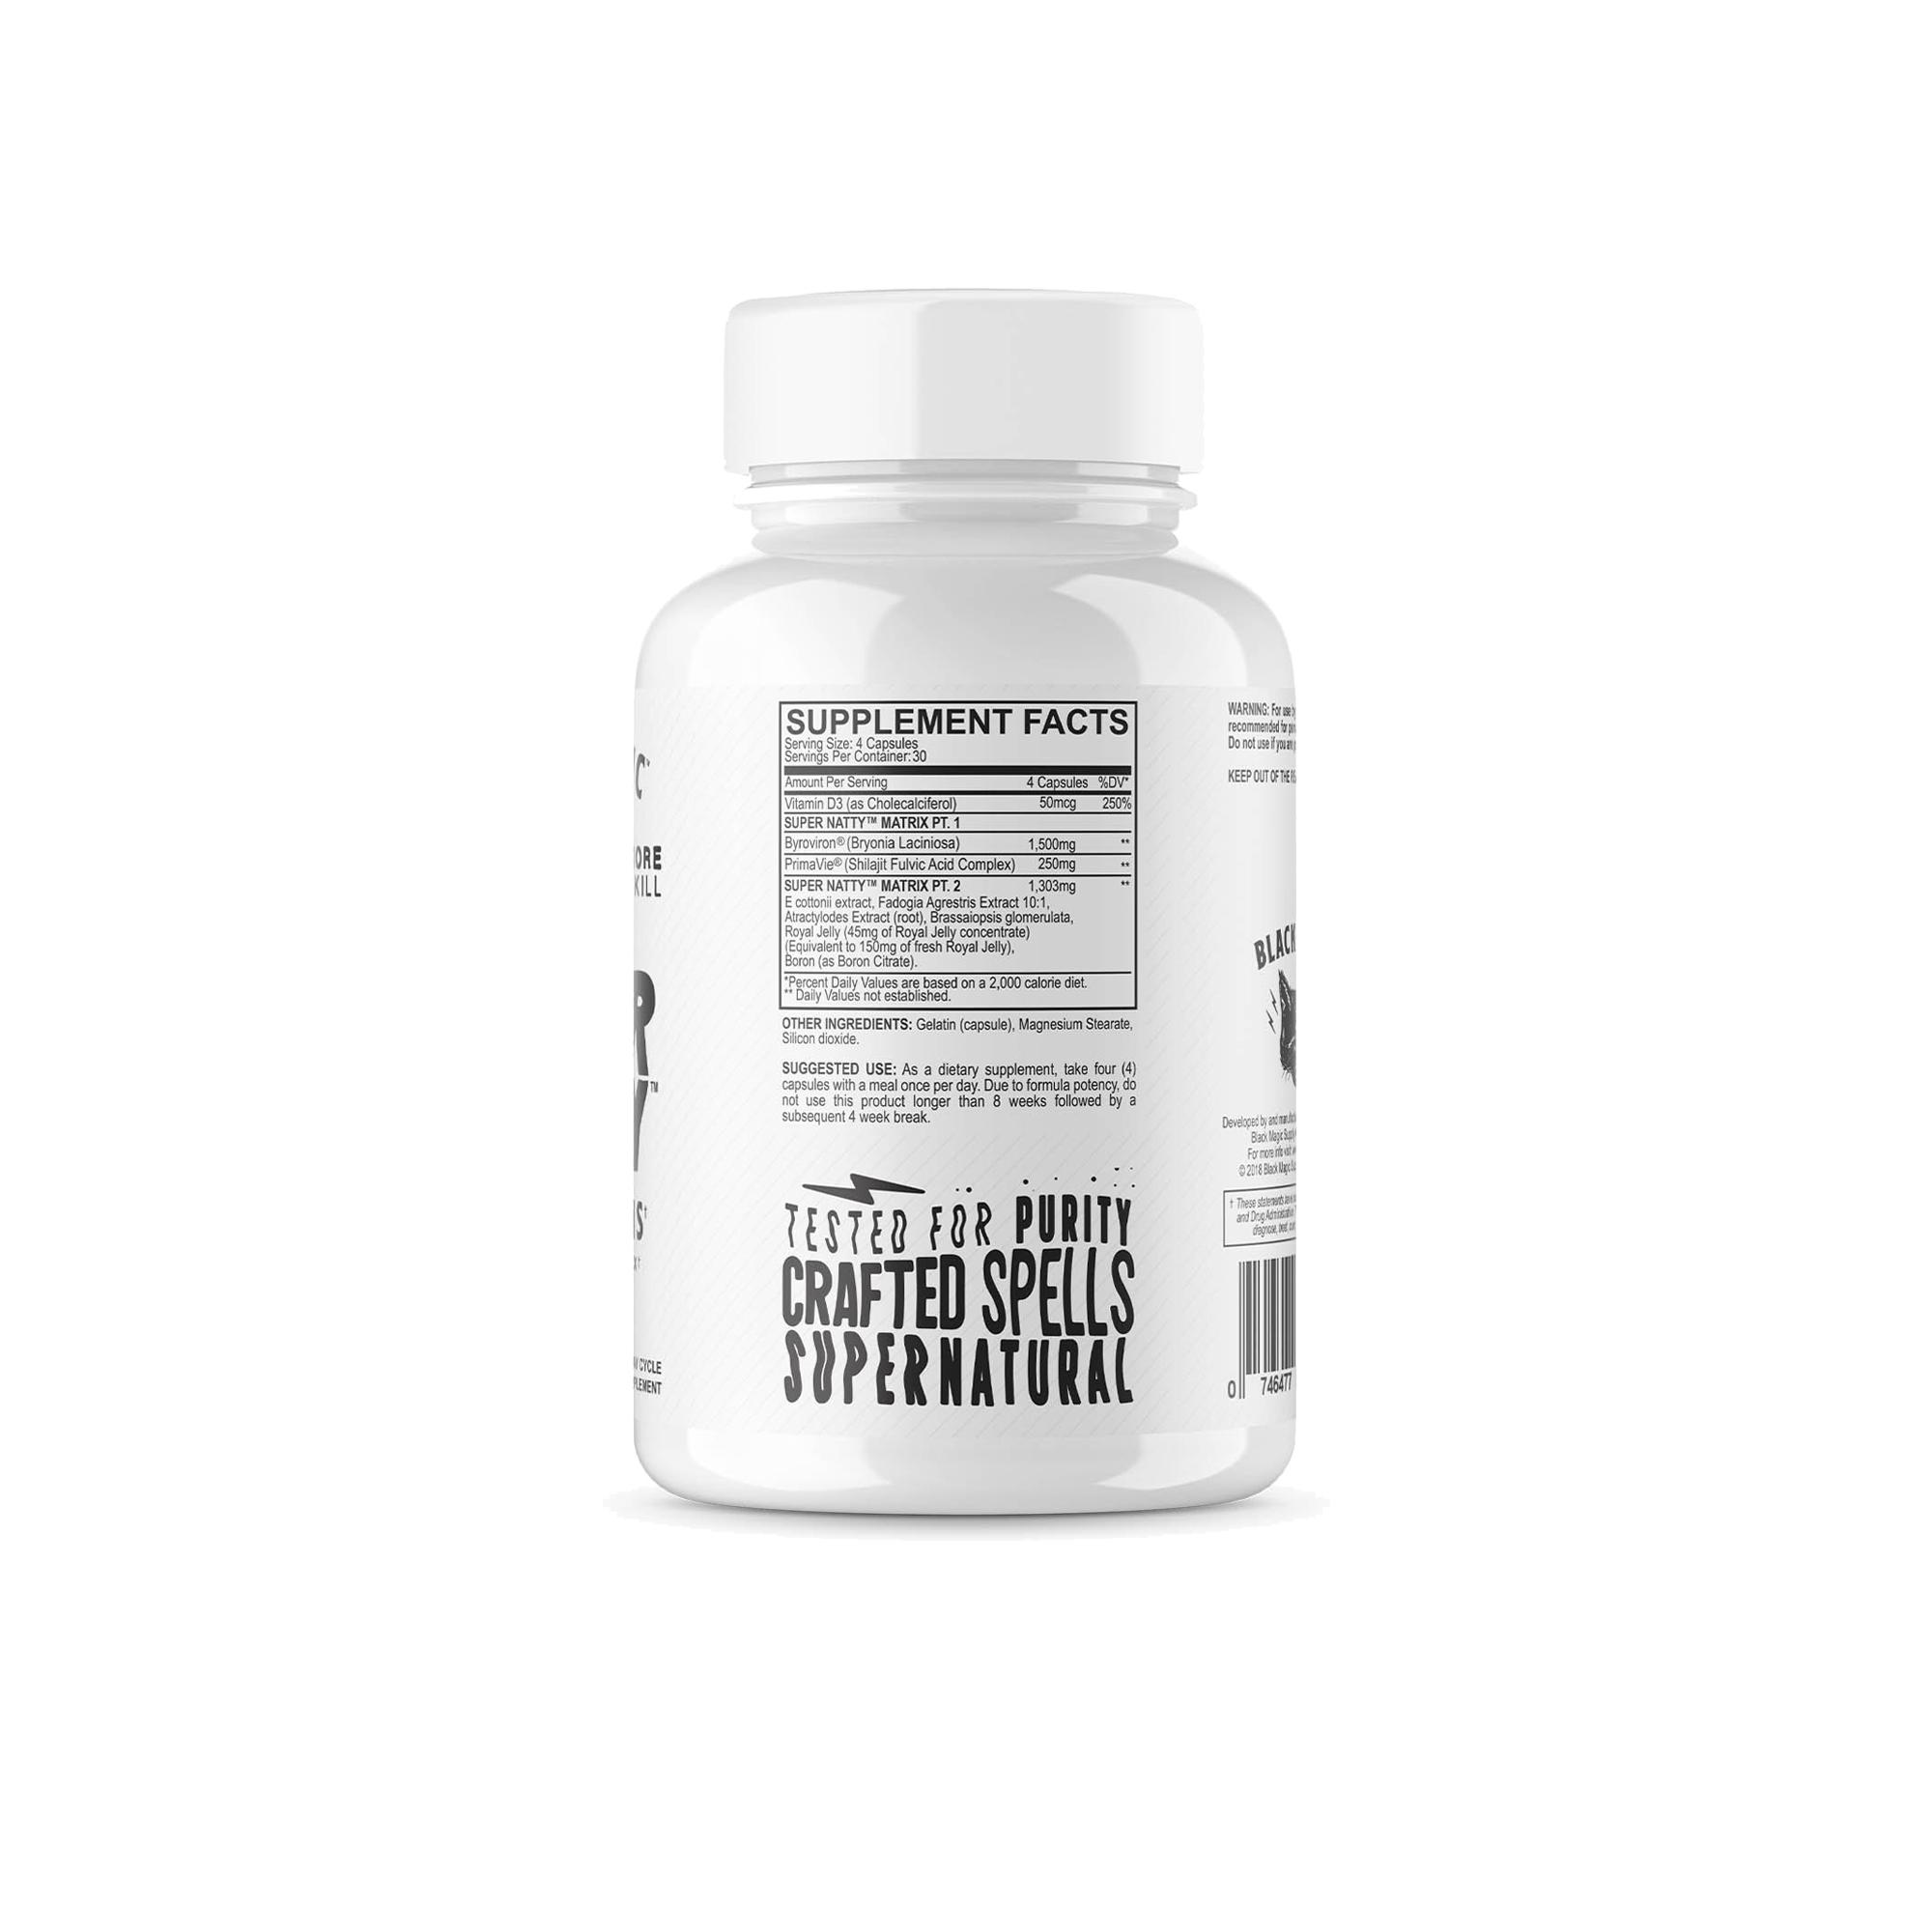 Black Magic - Super Natty Testosterone Matrix 30 Day Cycle - Nutrition Depot Philippines